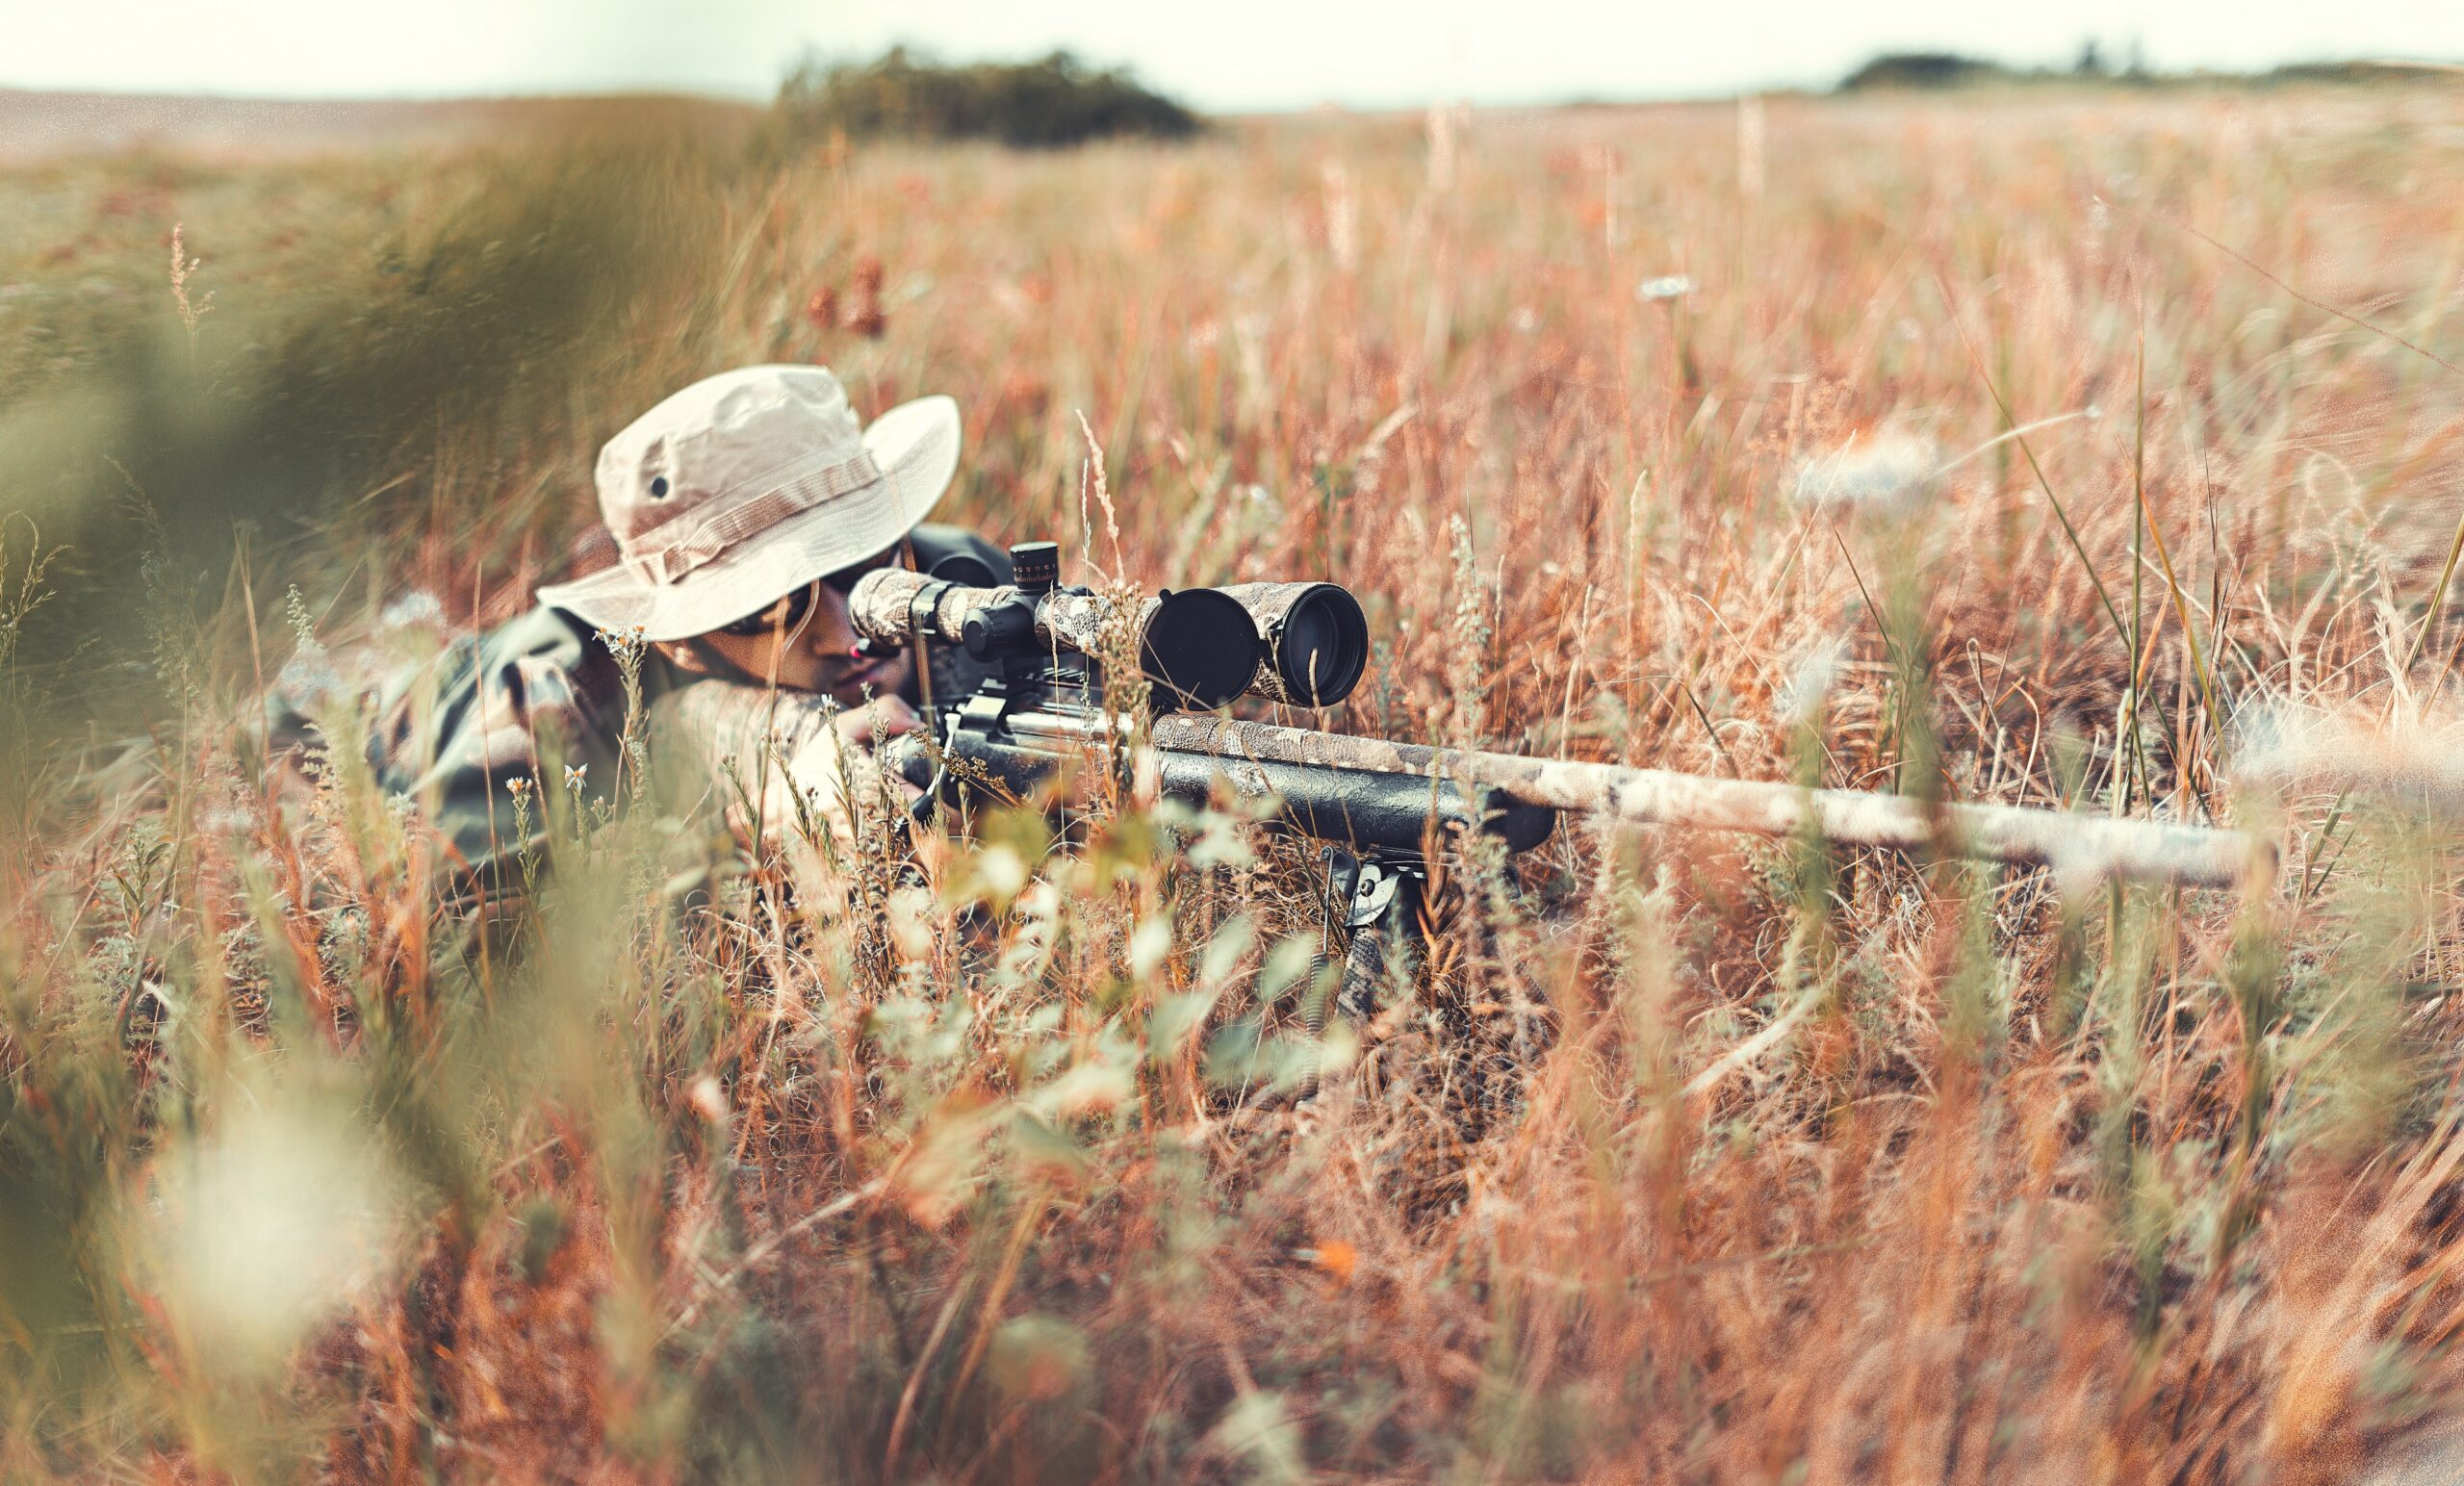 landpass common hunting mistakes to avoid